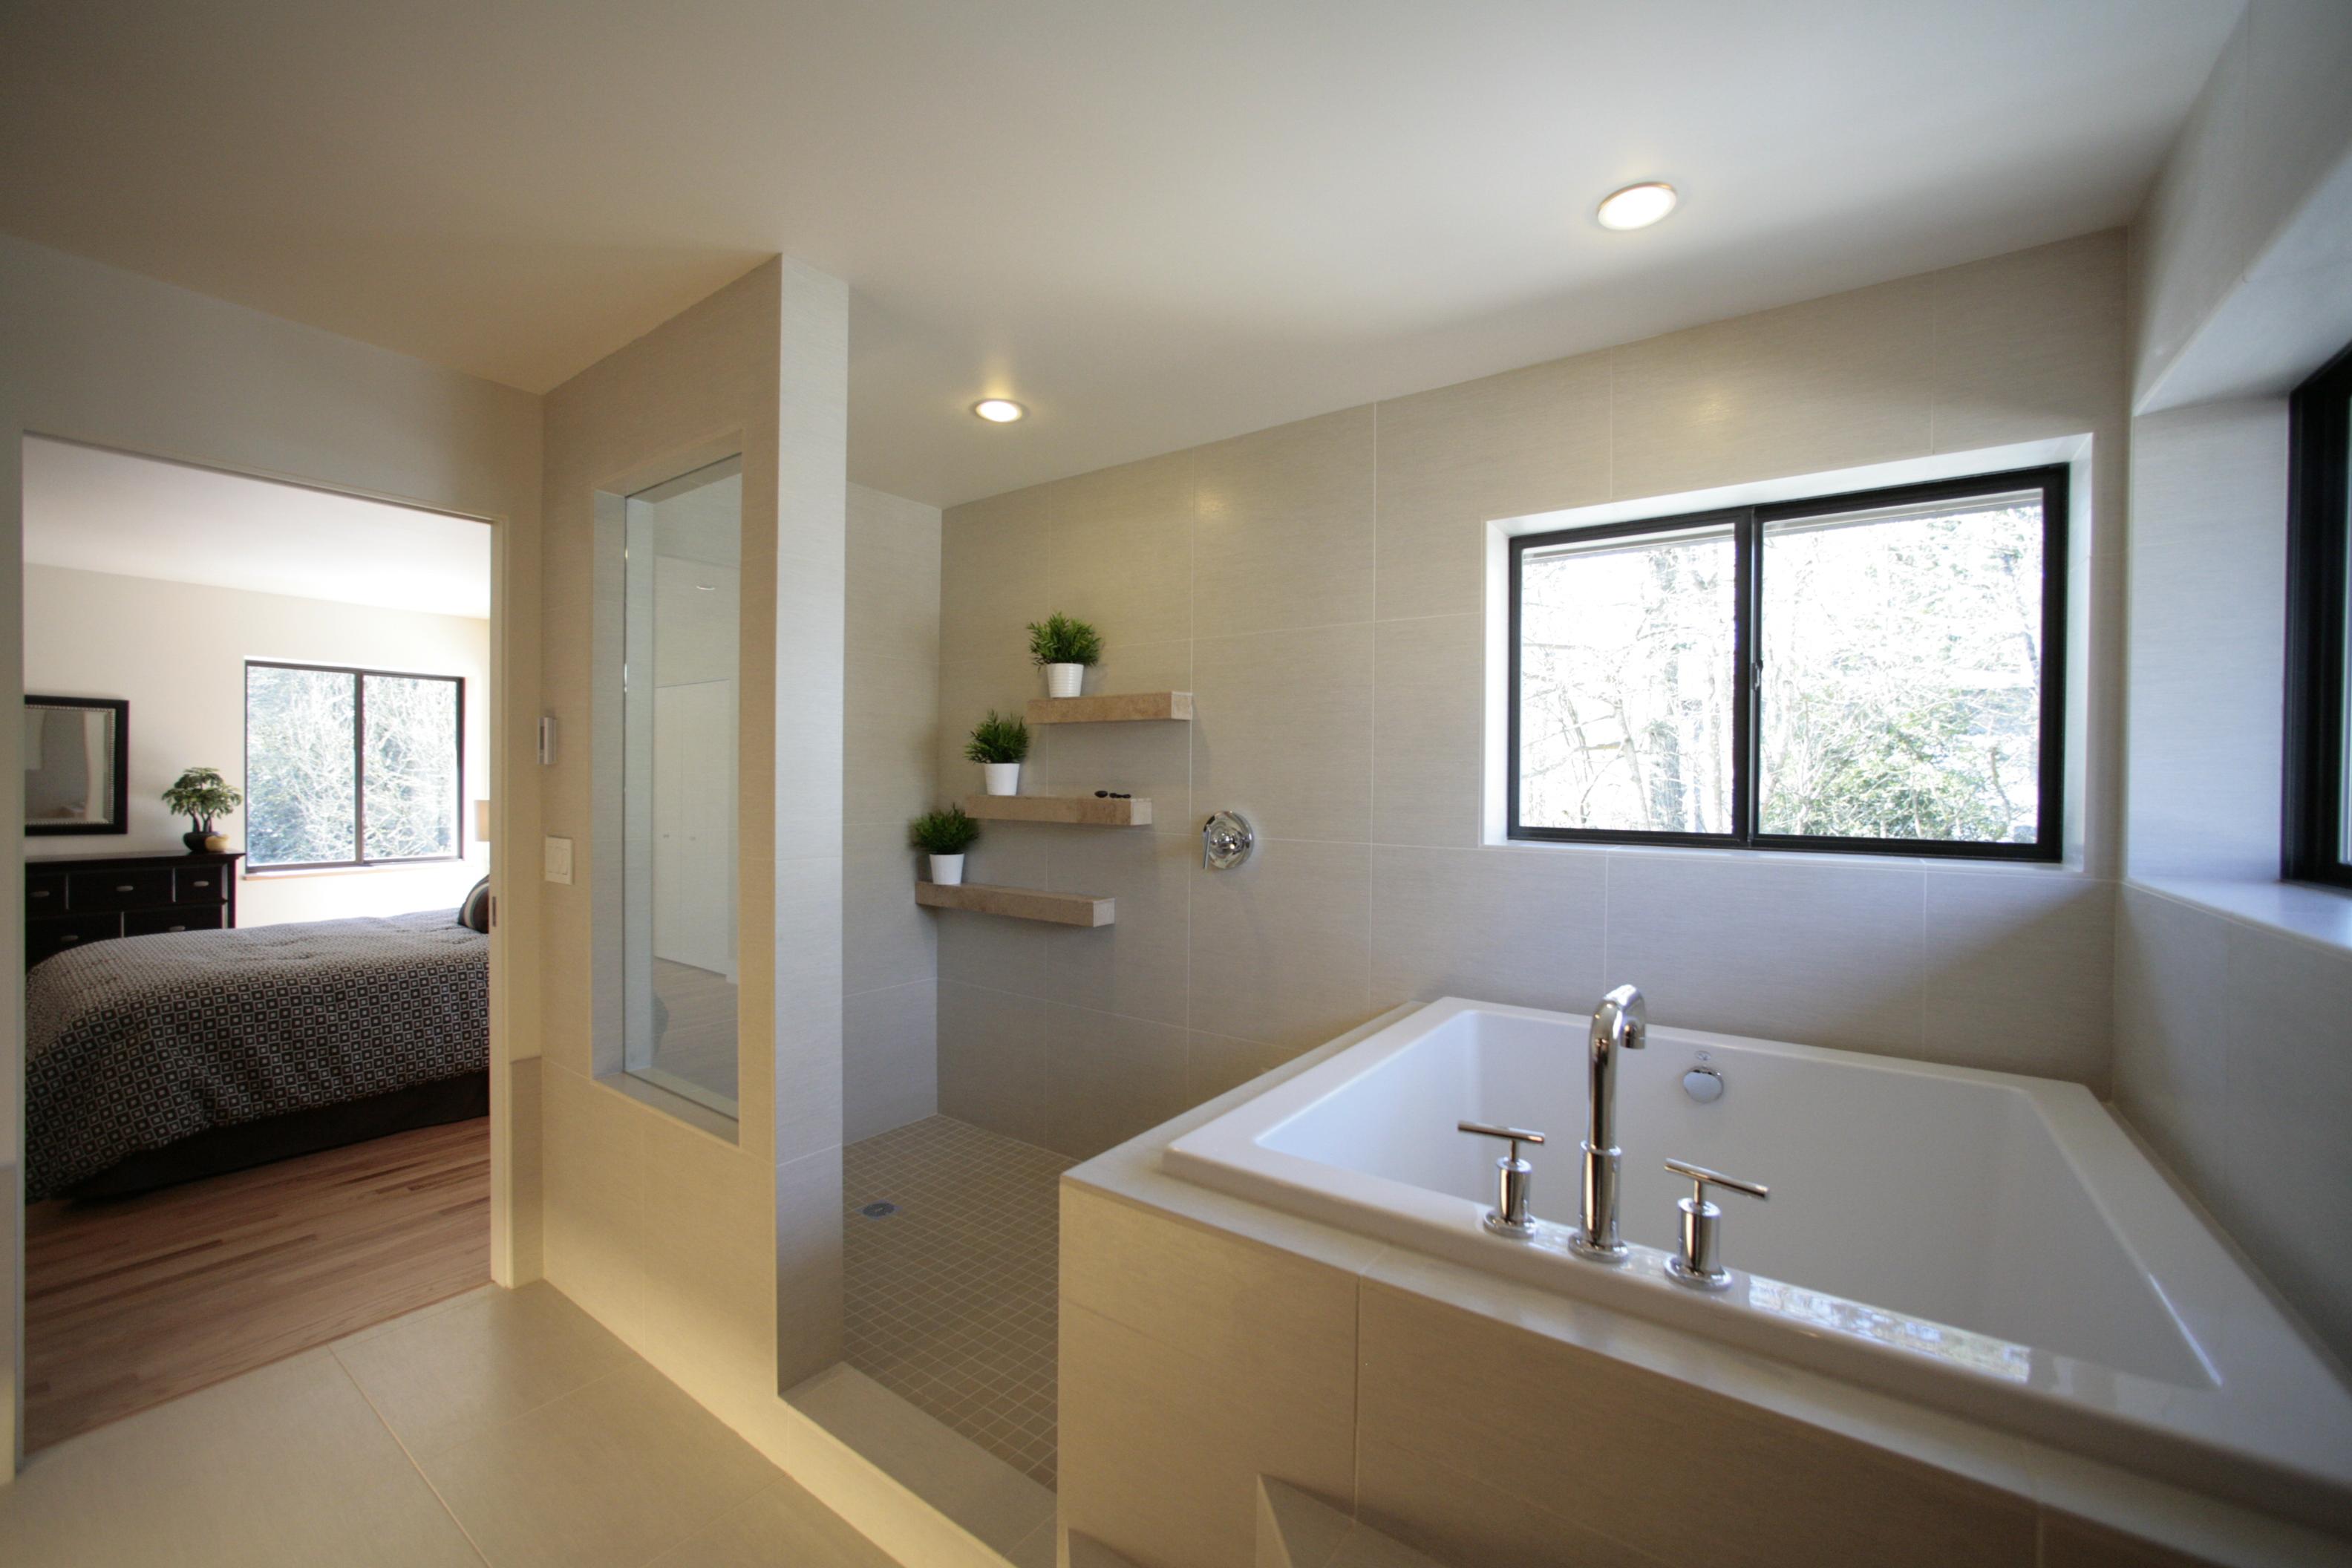 bathroom tub shower | homesfeed Tub Shower Design Ideas